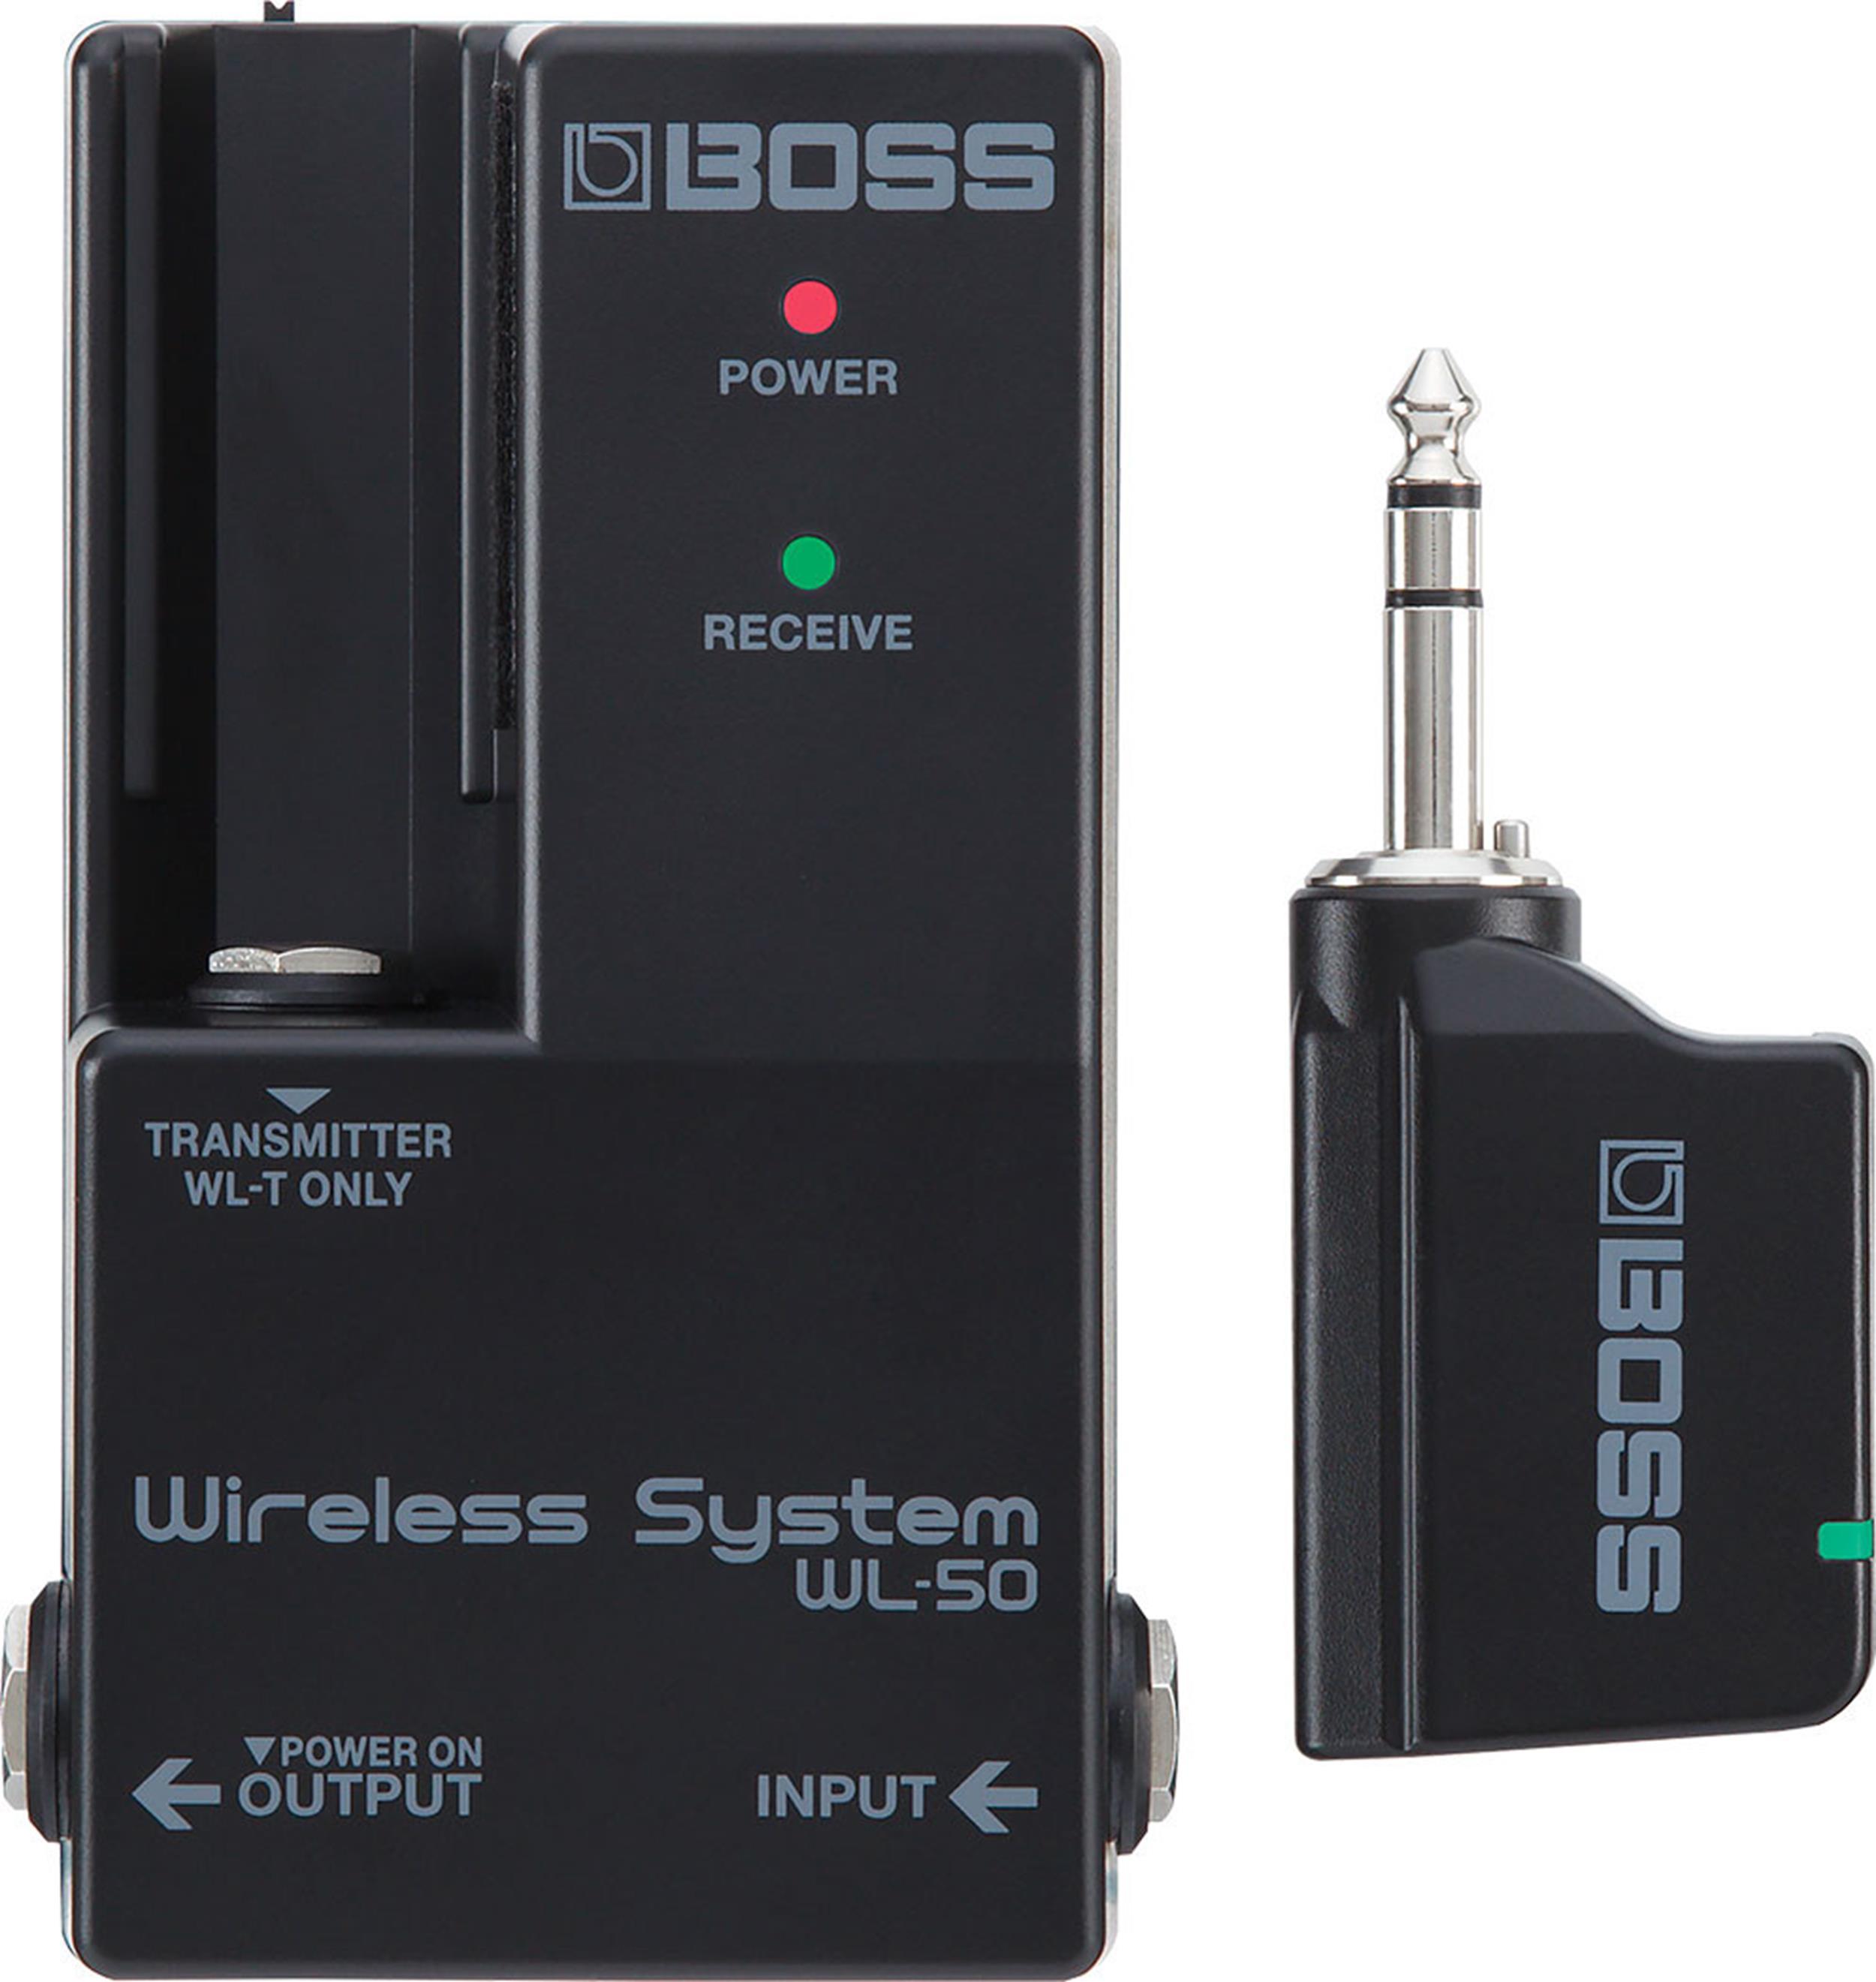 BOSS WL 50 WIRELESS GUITAR SYSTEM